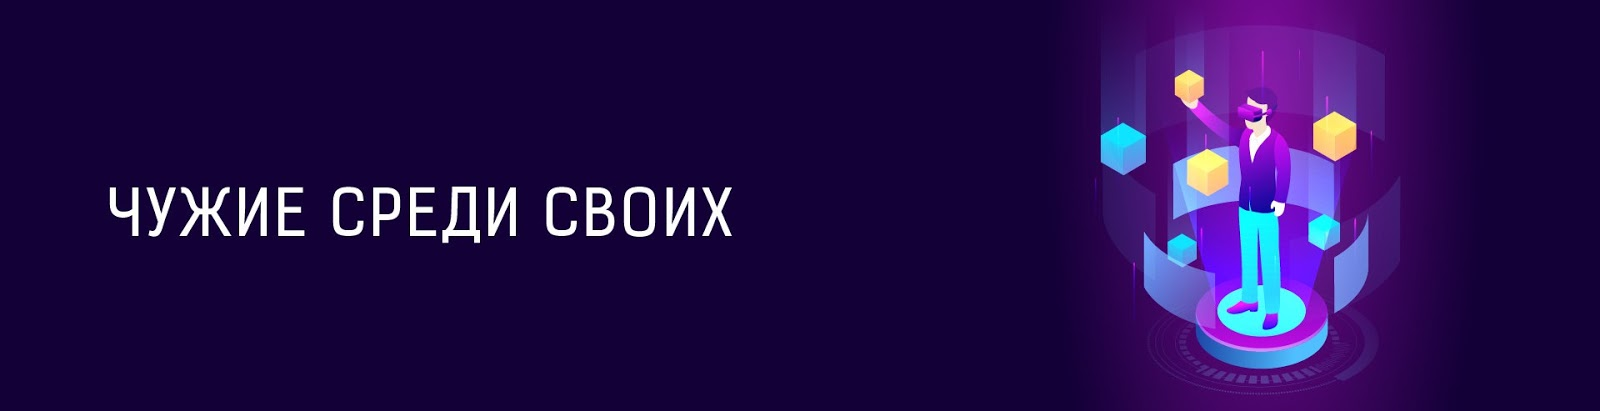 c200f86663d12b0cd934ff527436947d.jpg